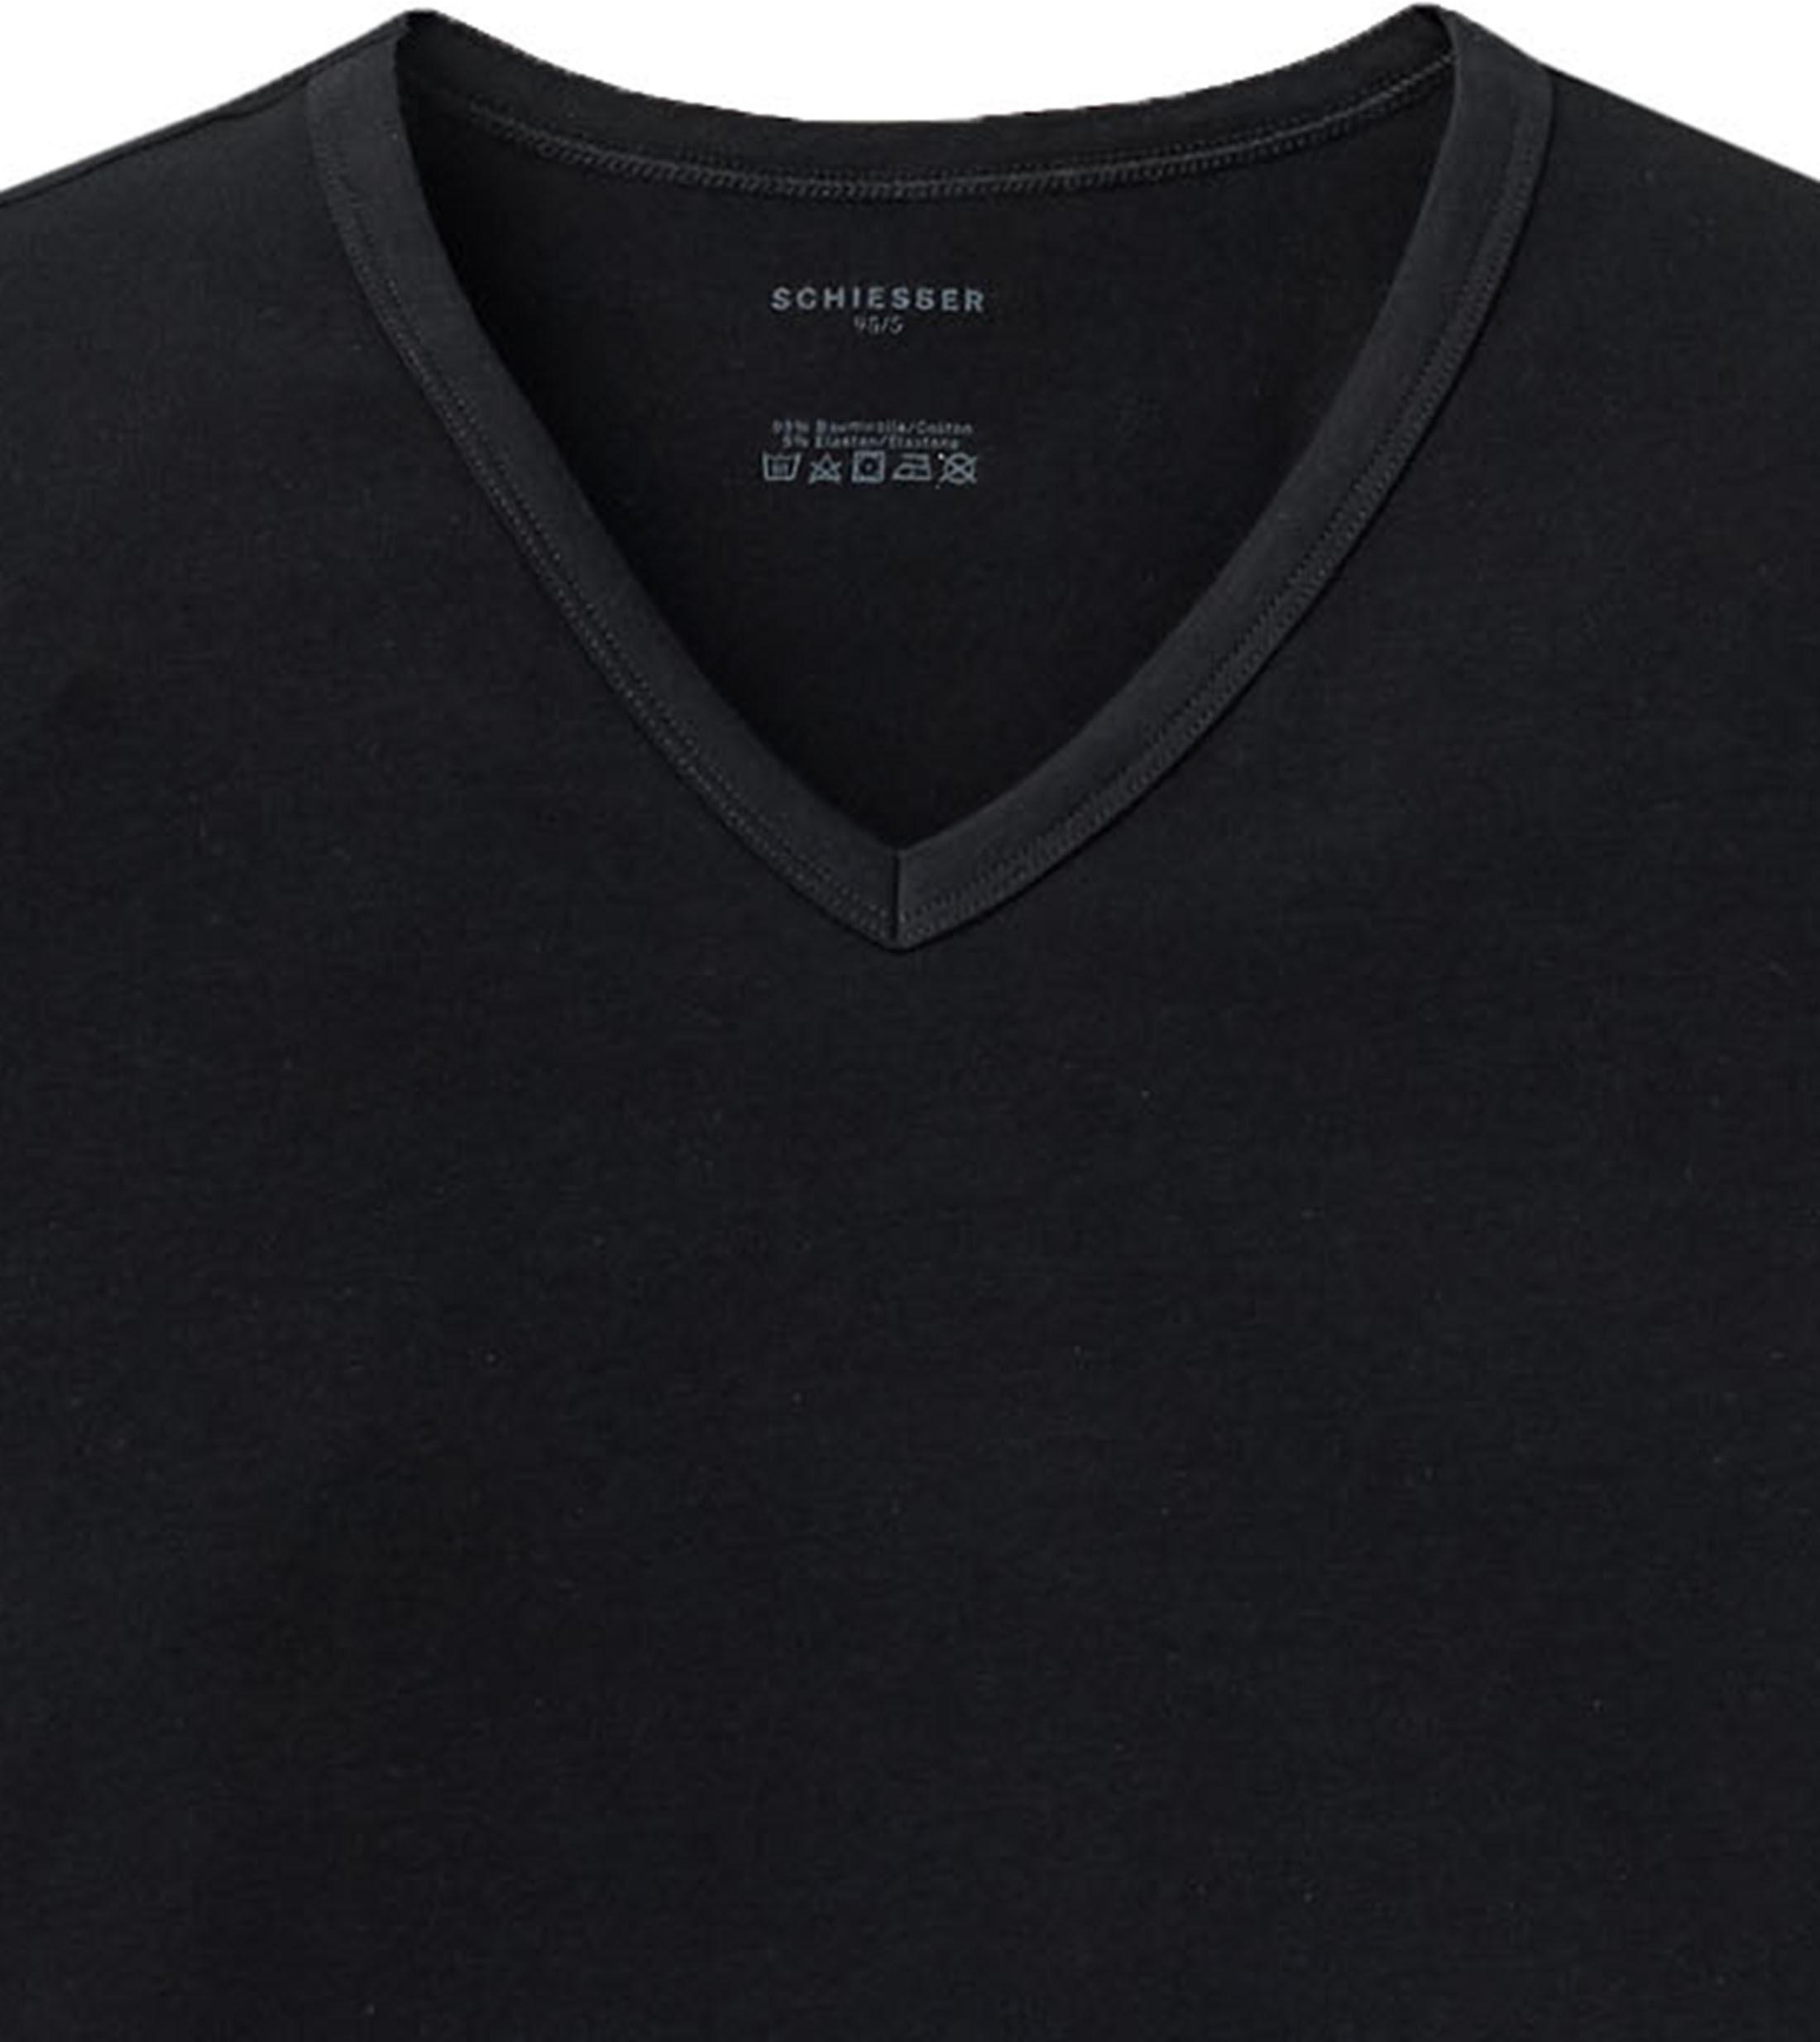 Schiesser T-shirt V-hals Zwart